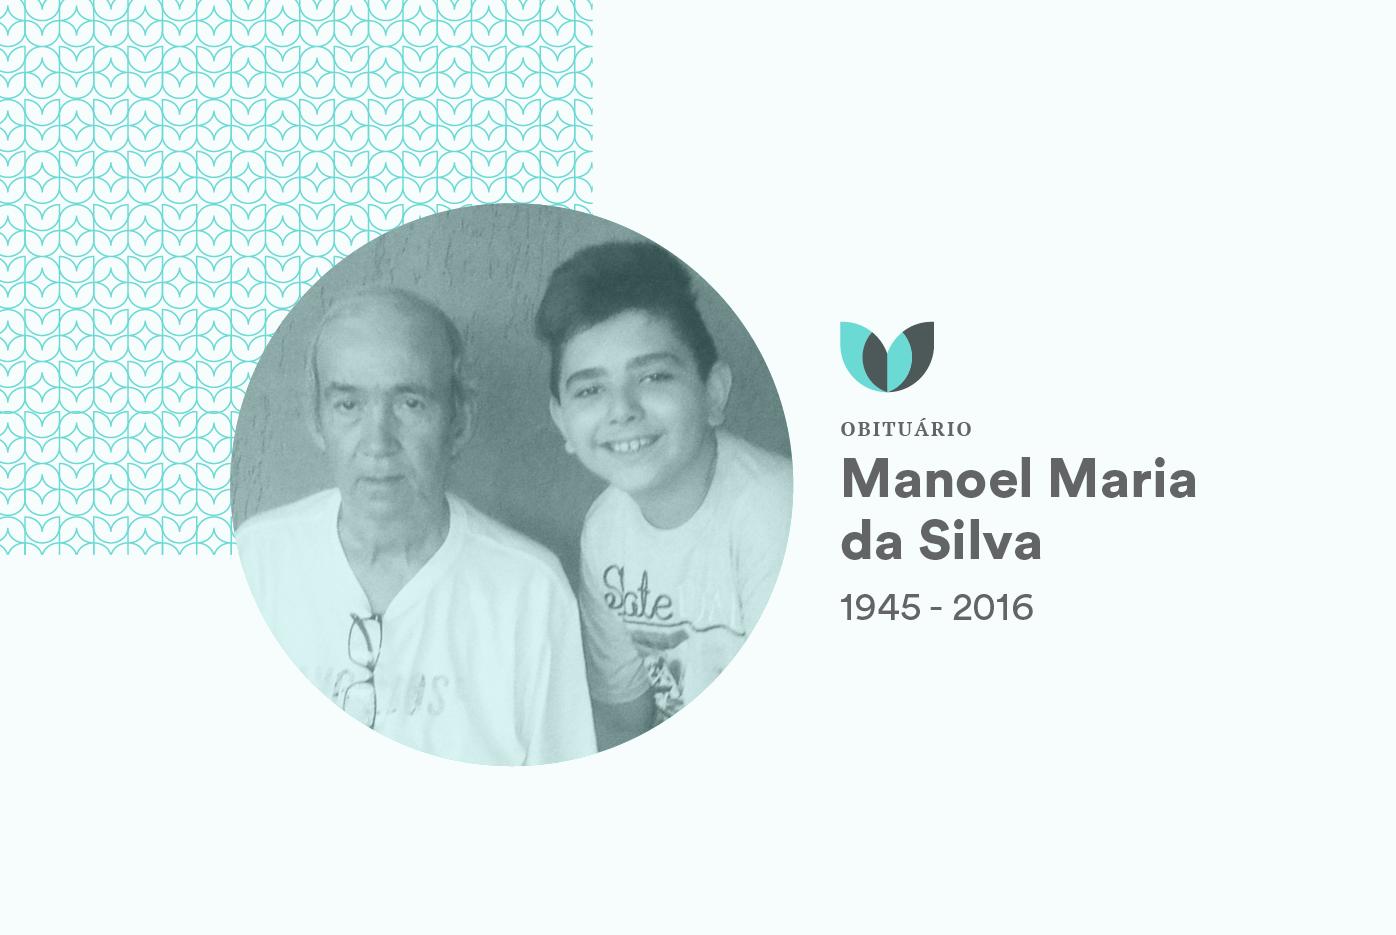 Obituario-Manoel-Squarespace.png